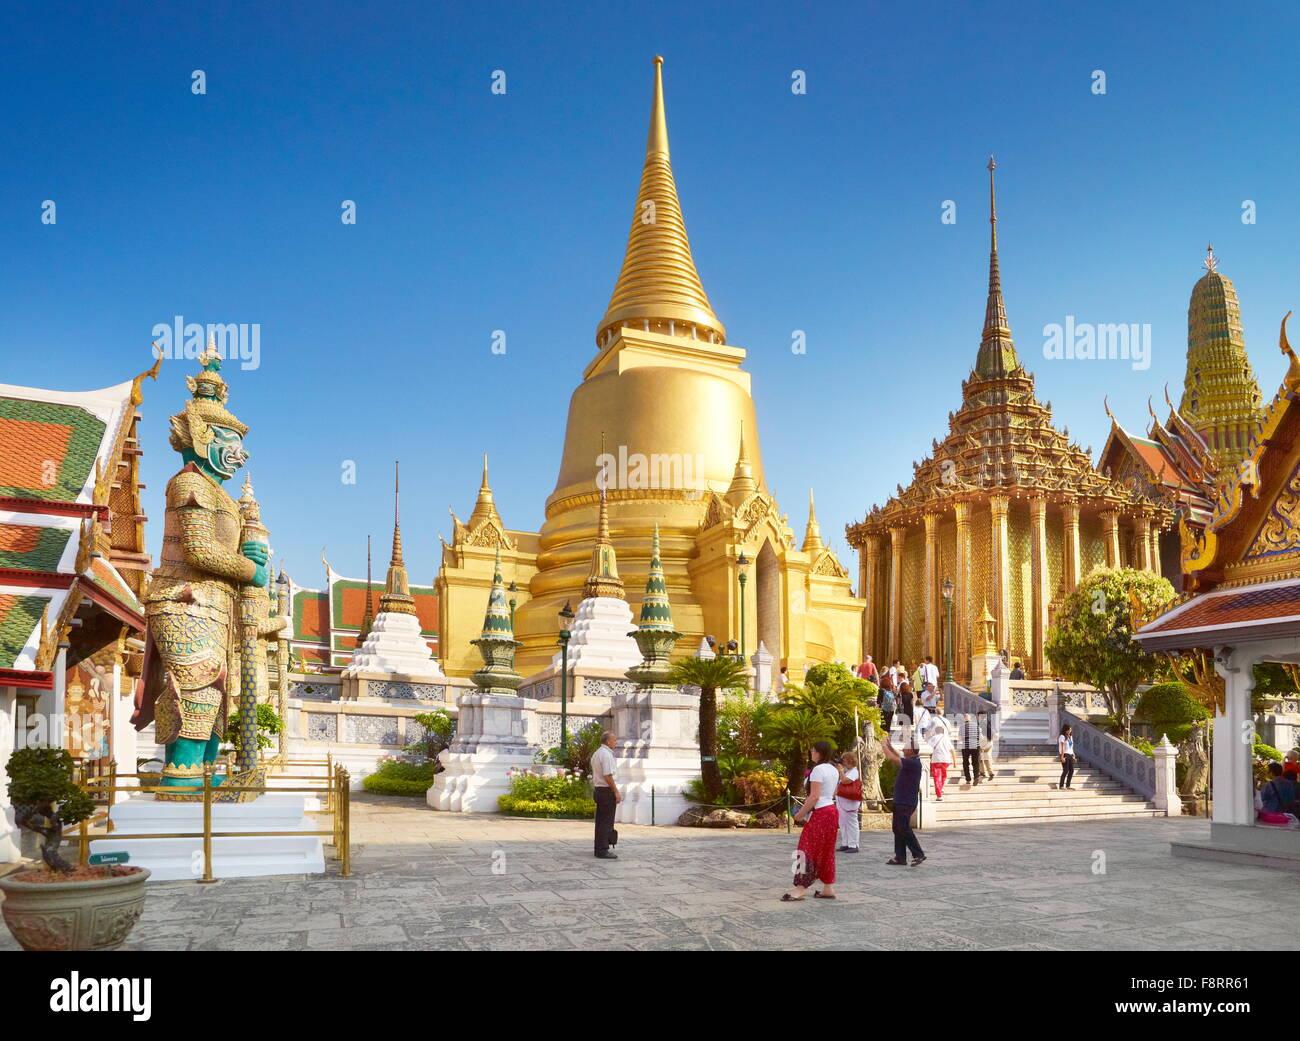 Tailandia - Bangkok, el Gran Palacio, Wat Phra Kaeo, Golden Chedi Imagen De Stock